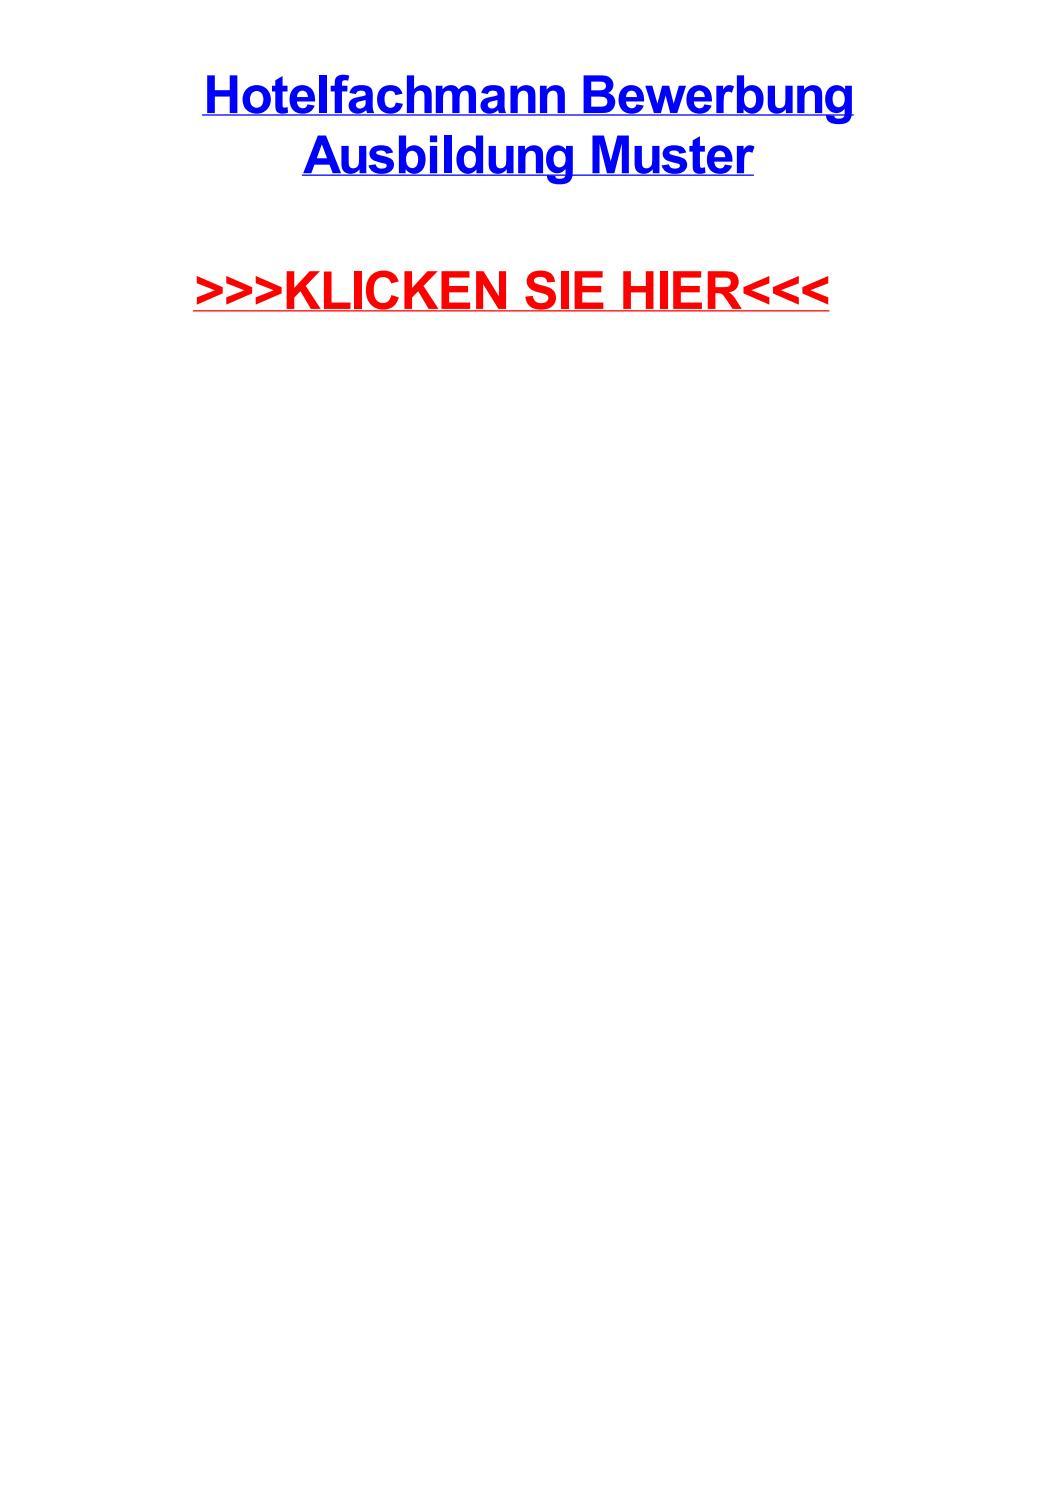 Hotelfachmann Bewerbung Ausbildung Muster By Earlkojf Issuu